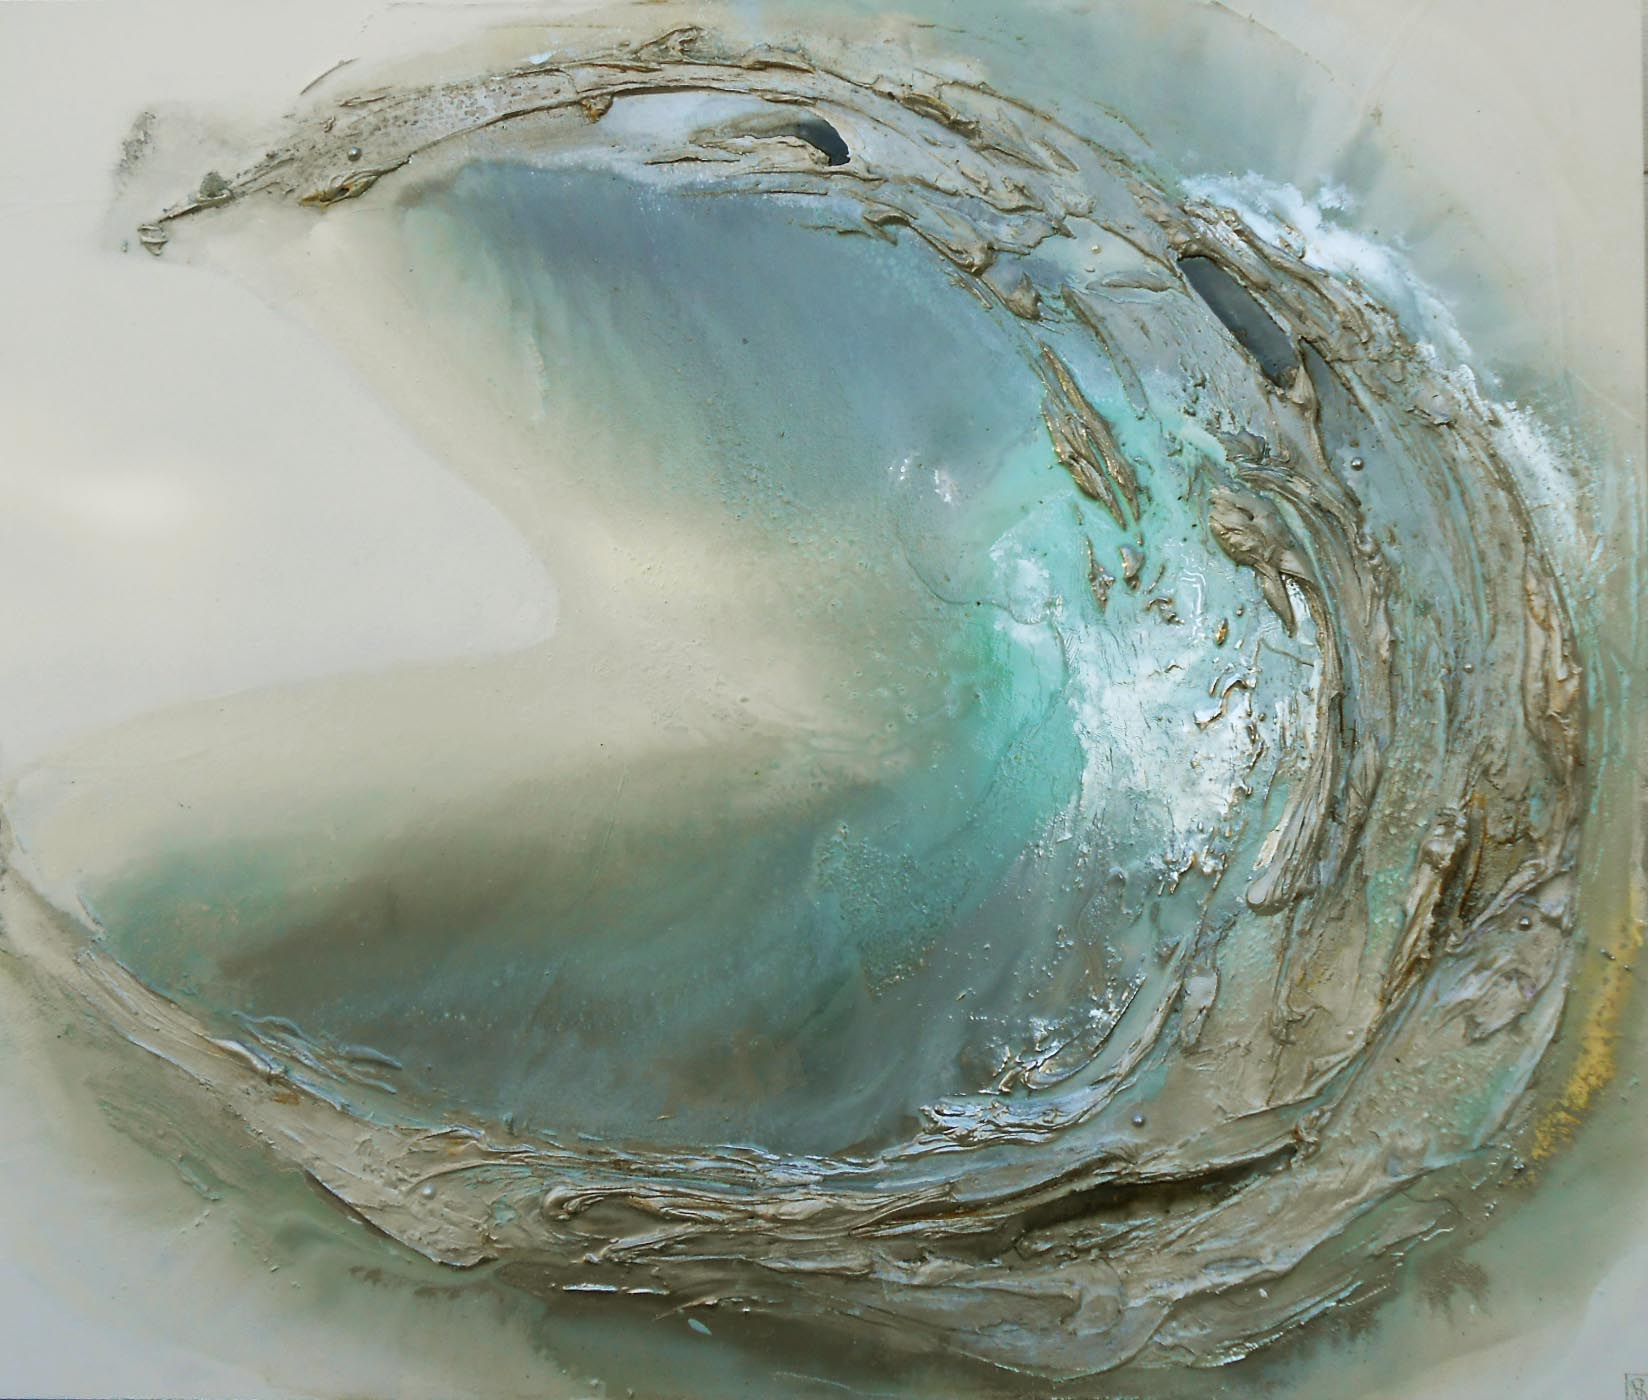 Vicky Sanders Oyster Series - Light Blue Oyster